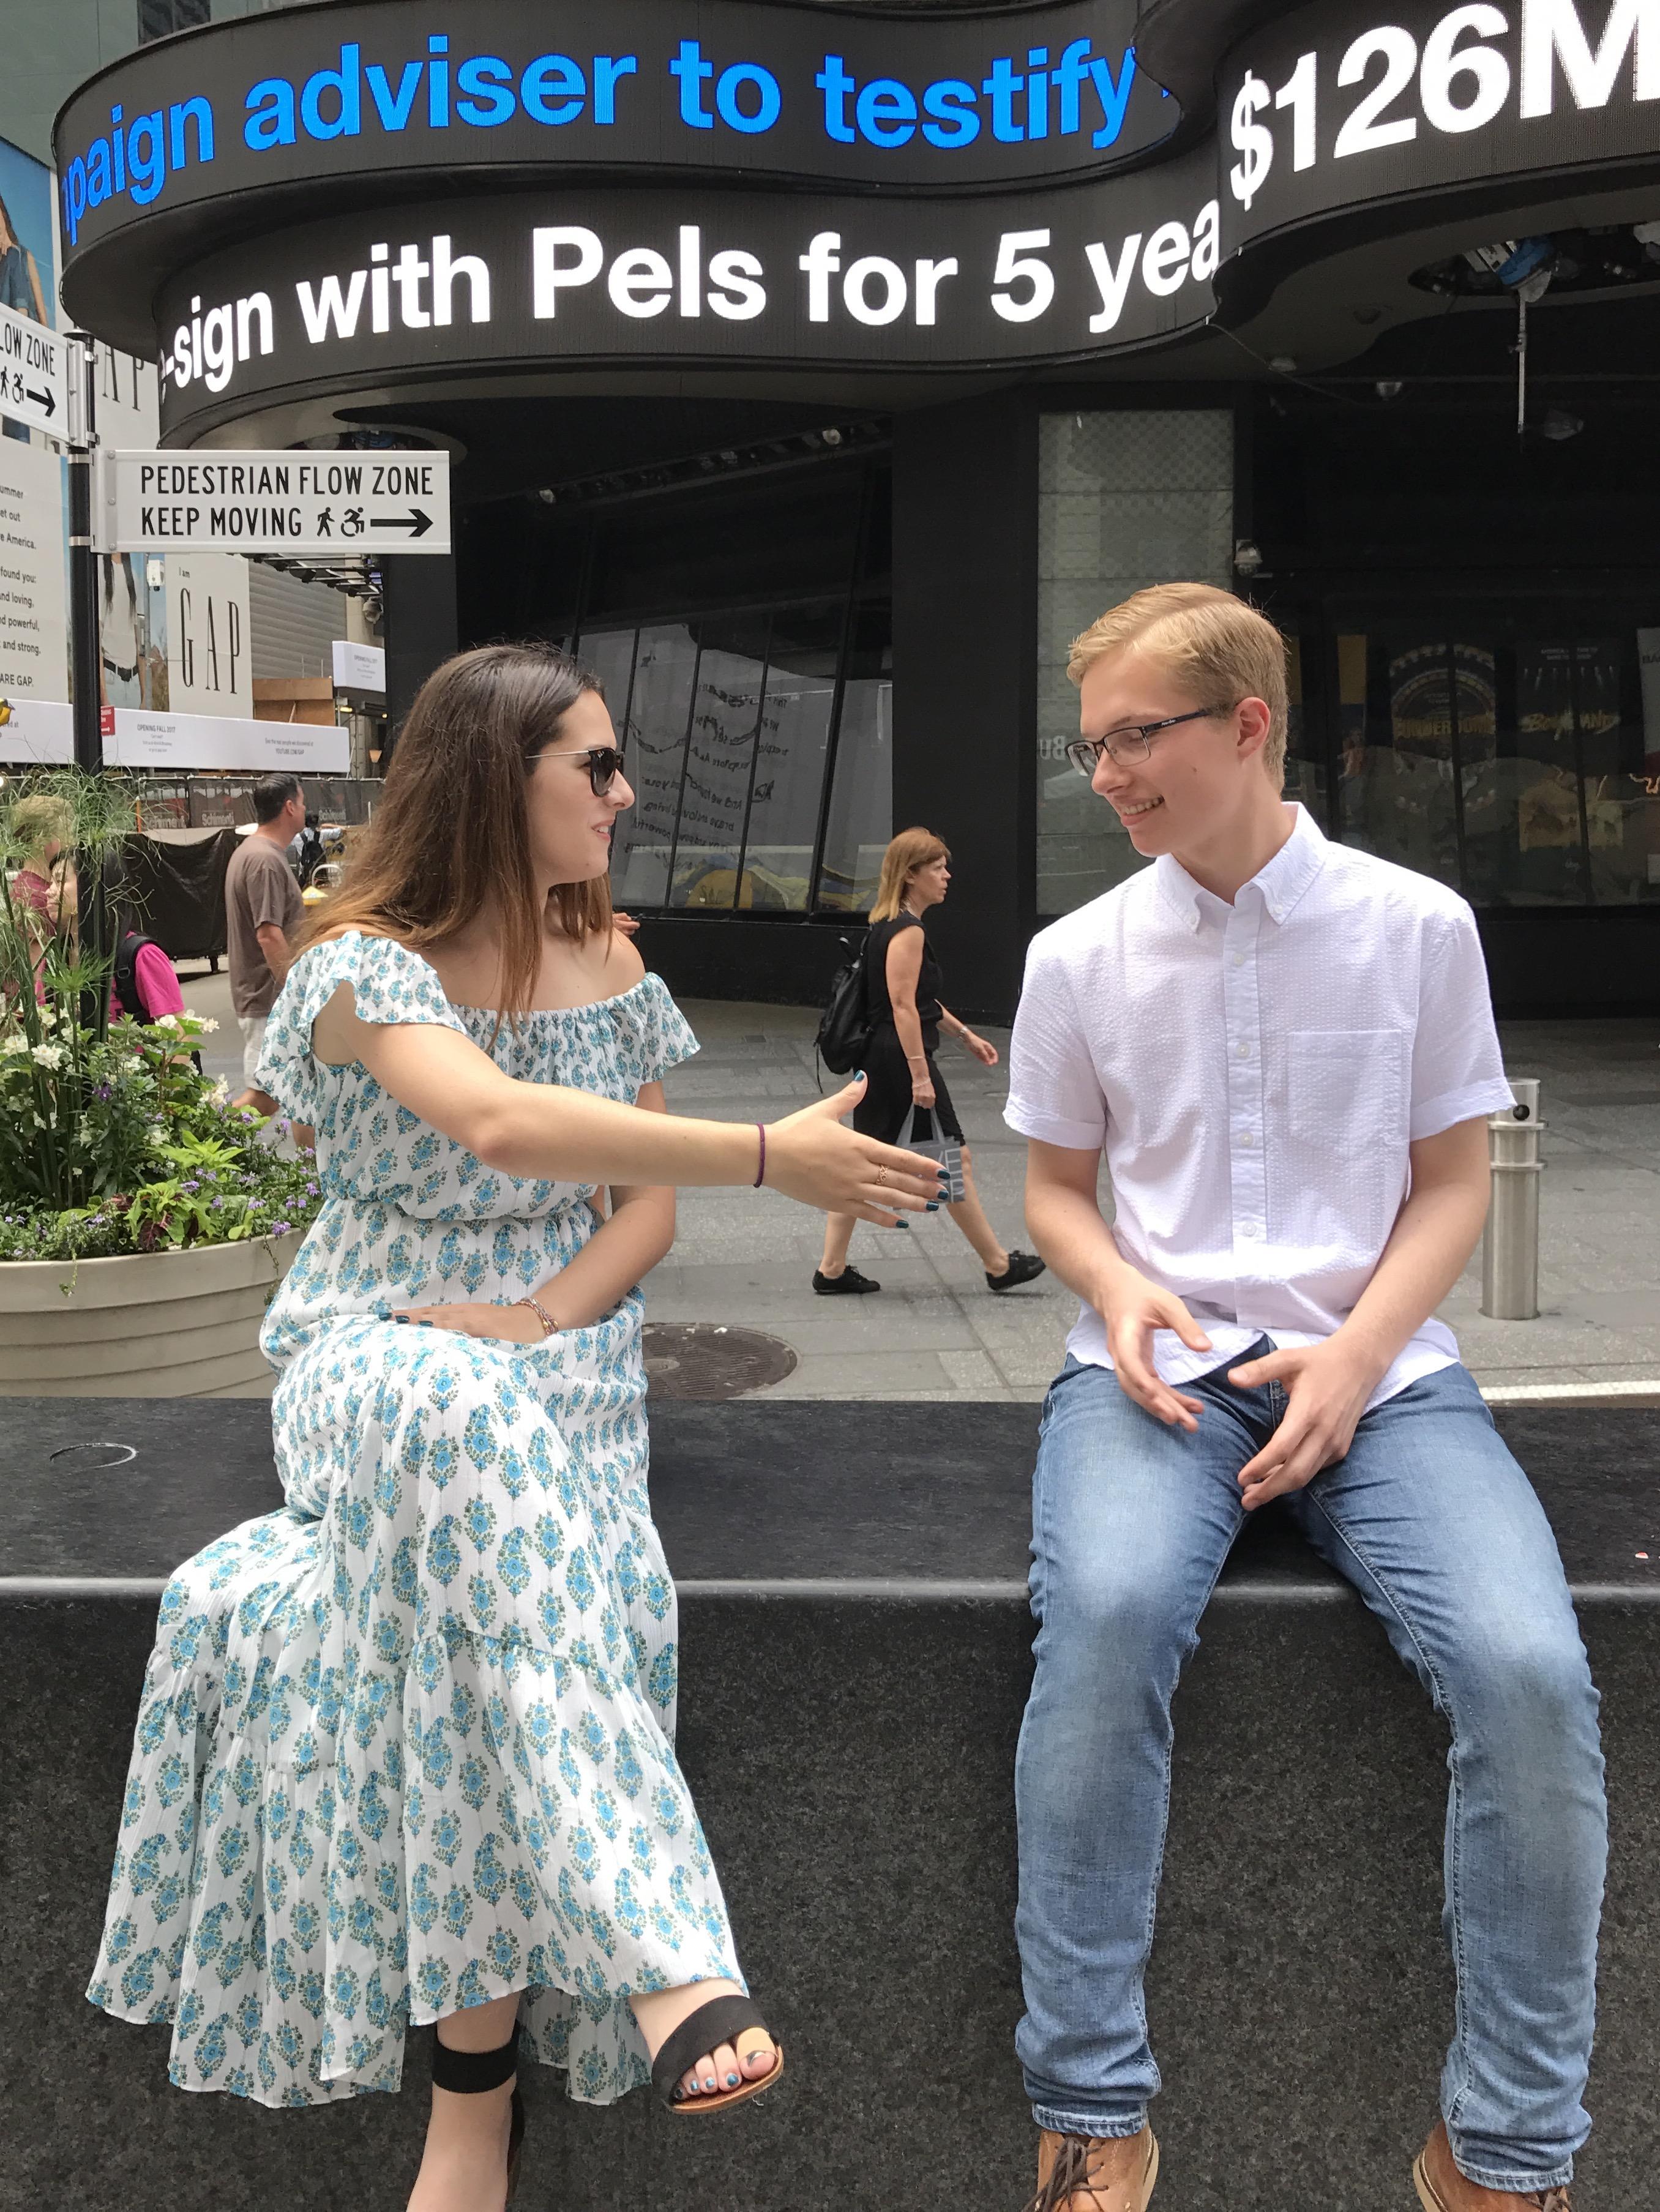 The Pre-Handshake